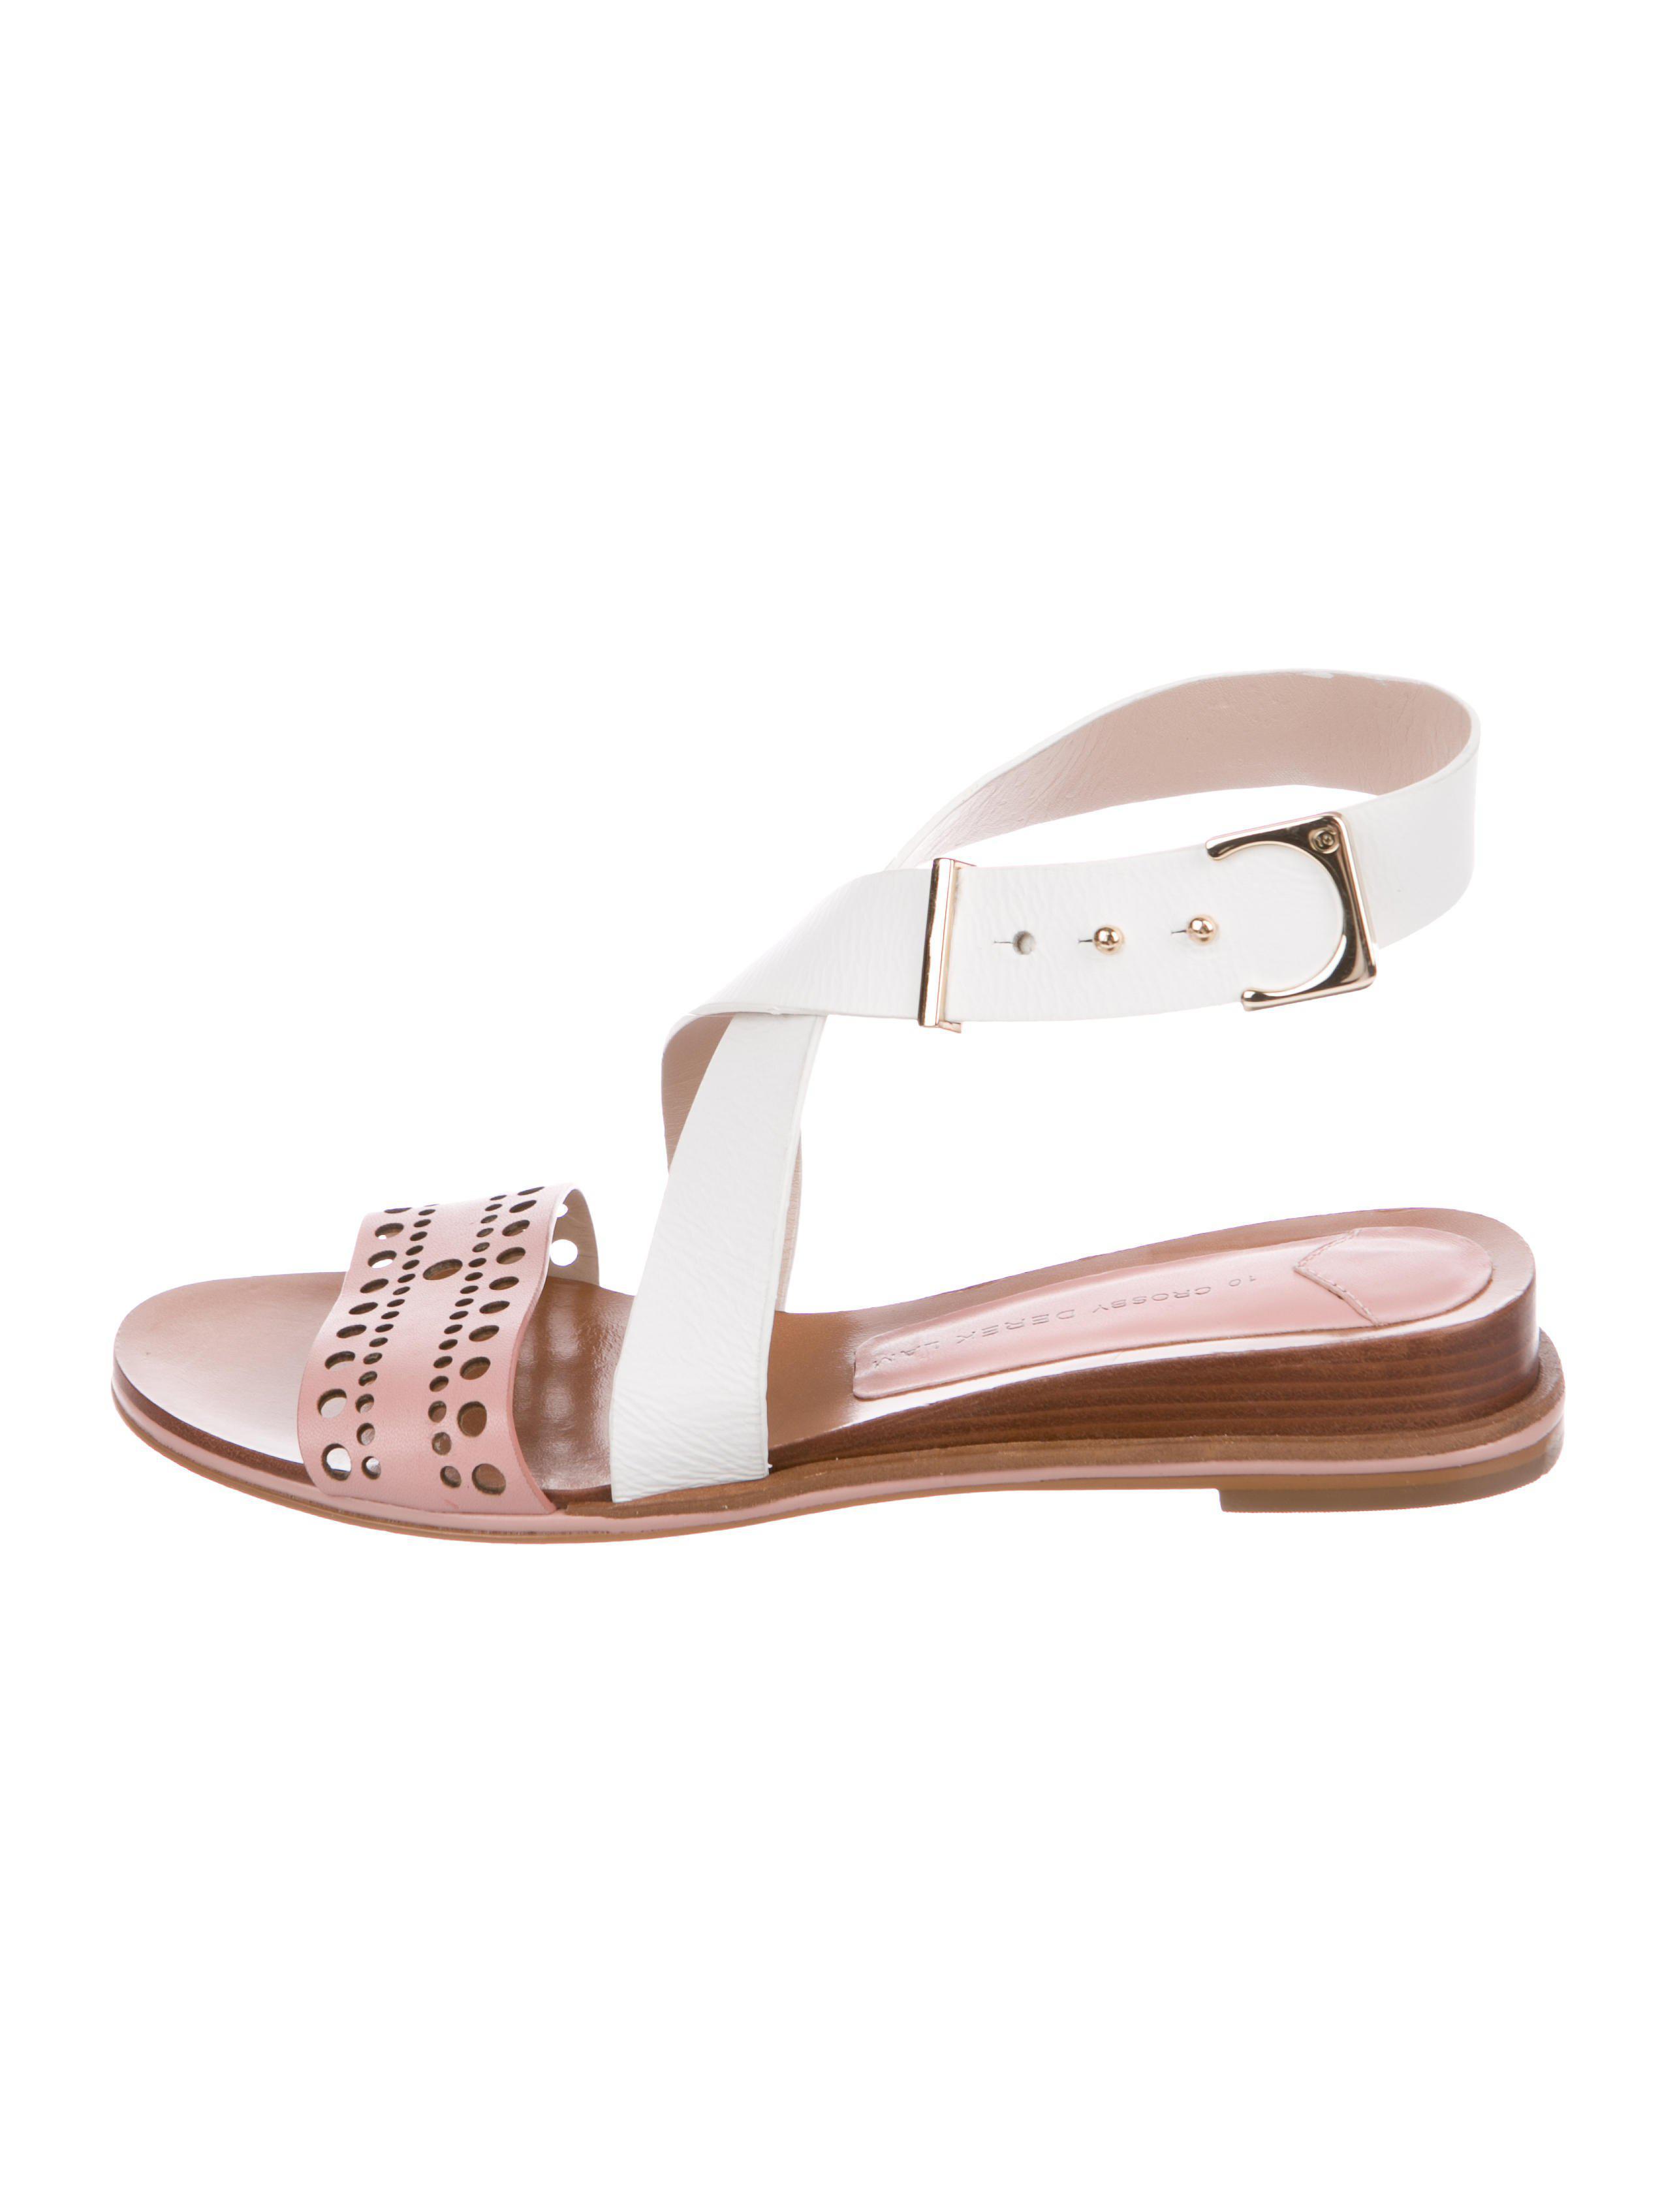 26df5c1f849977 Lyst - 10 Crosby Derek Lam Leather Laser Cut Sandals in Pink